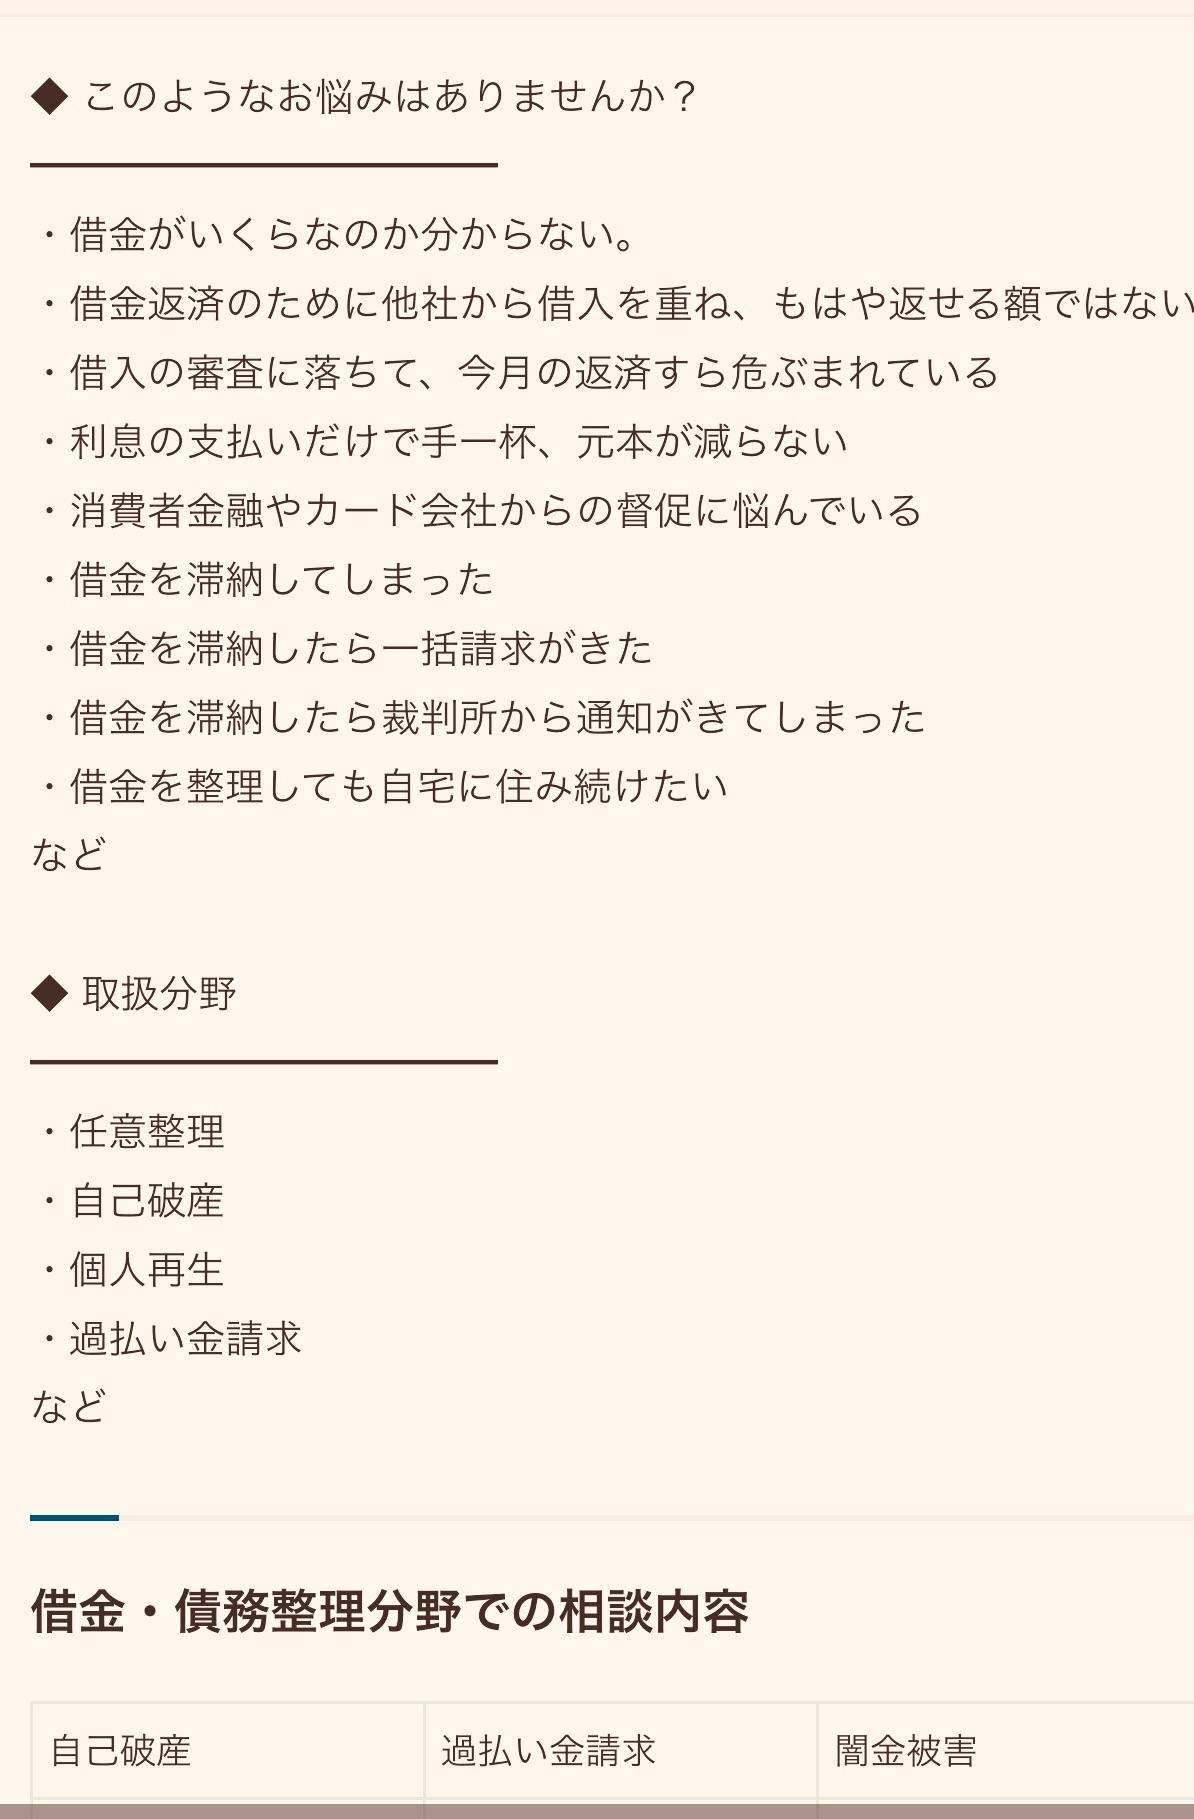 f:id:kagaribi-kotsujiko:20210123180638j:plain